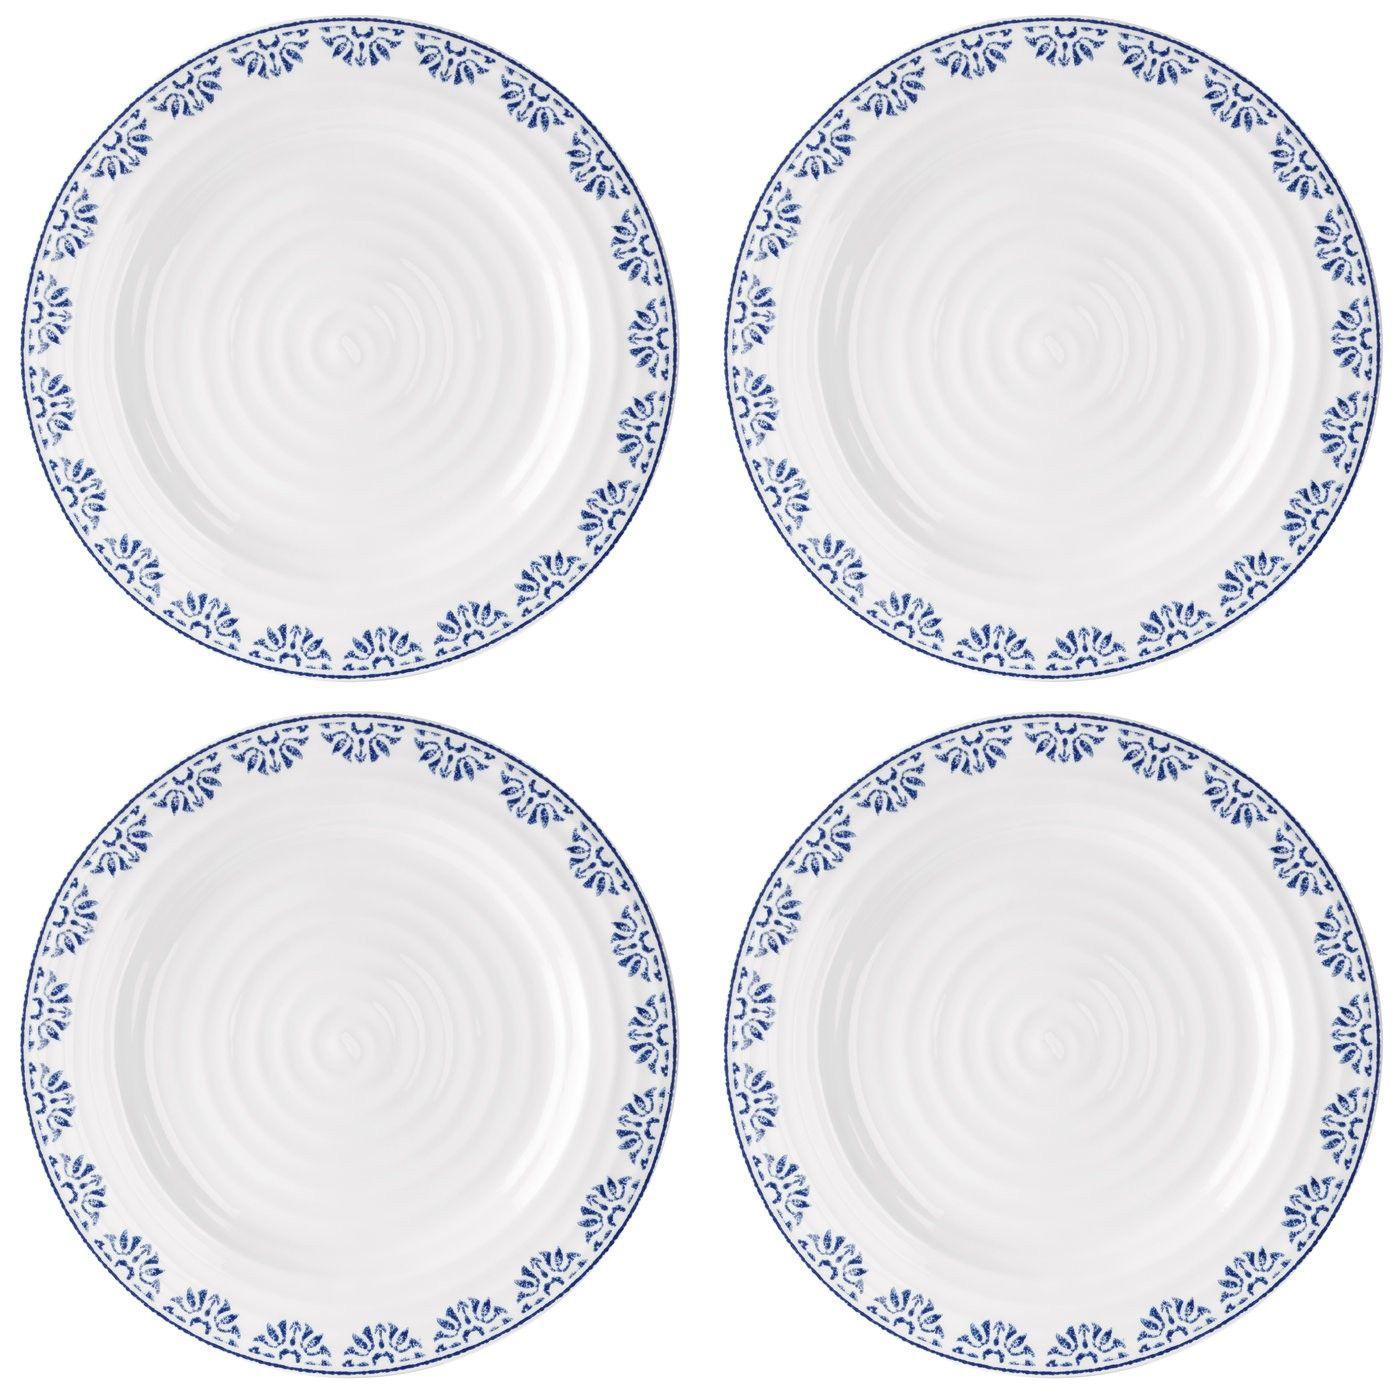 Sophie Conran for Portmeirion Betty Dinner Plate Set of 4